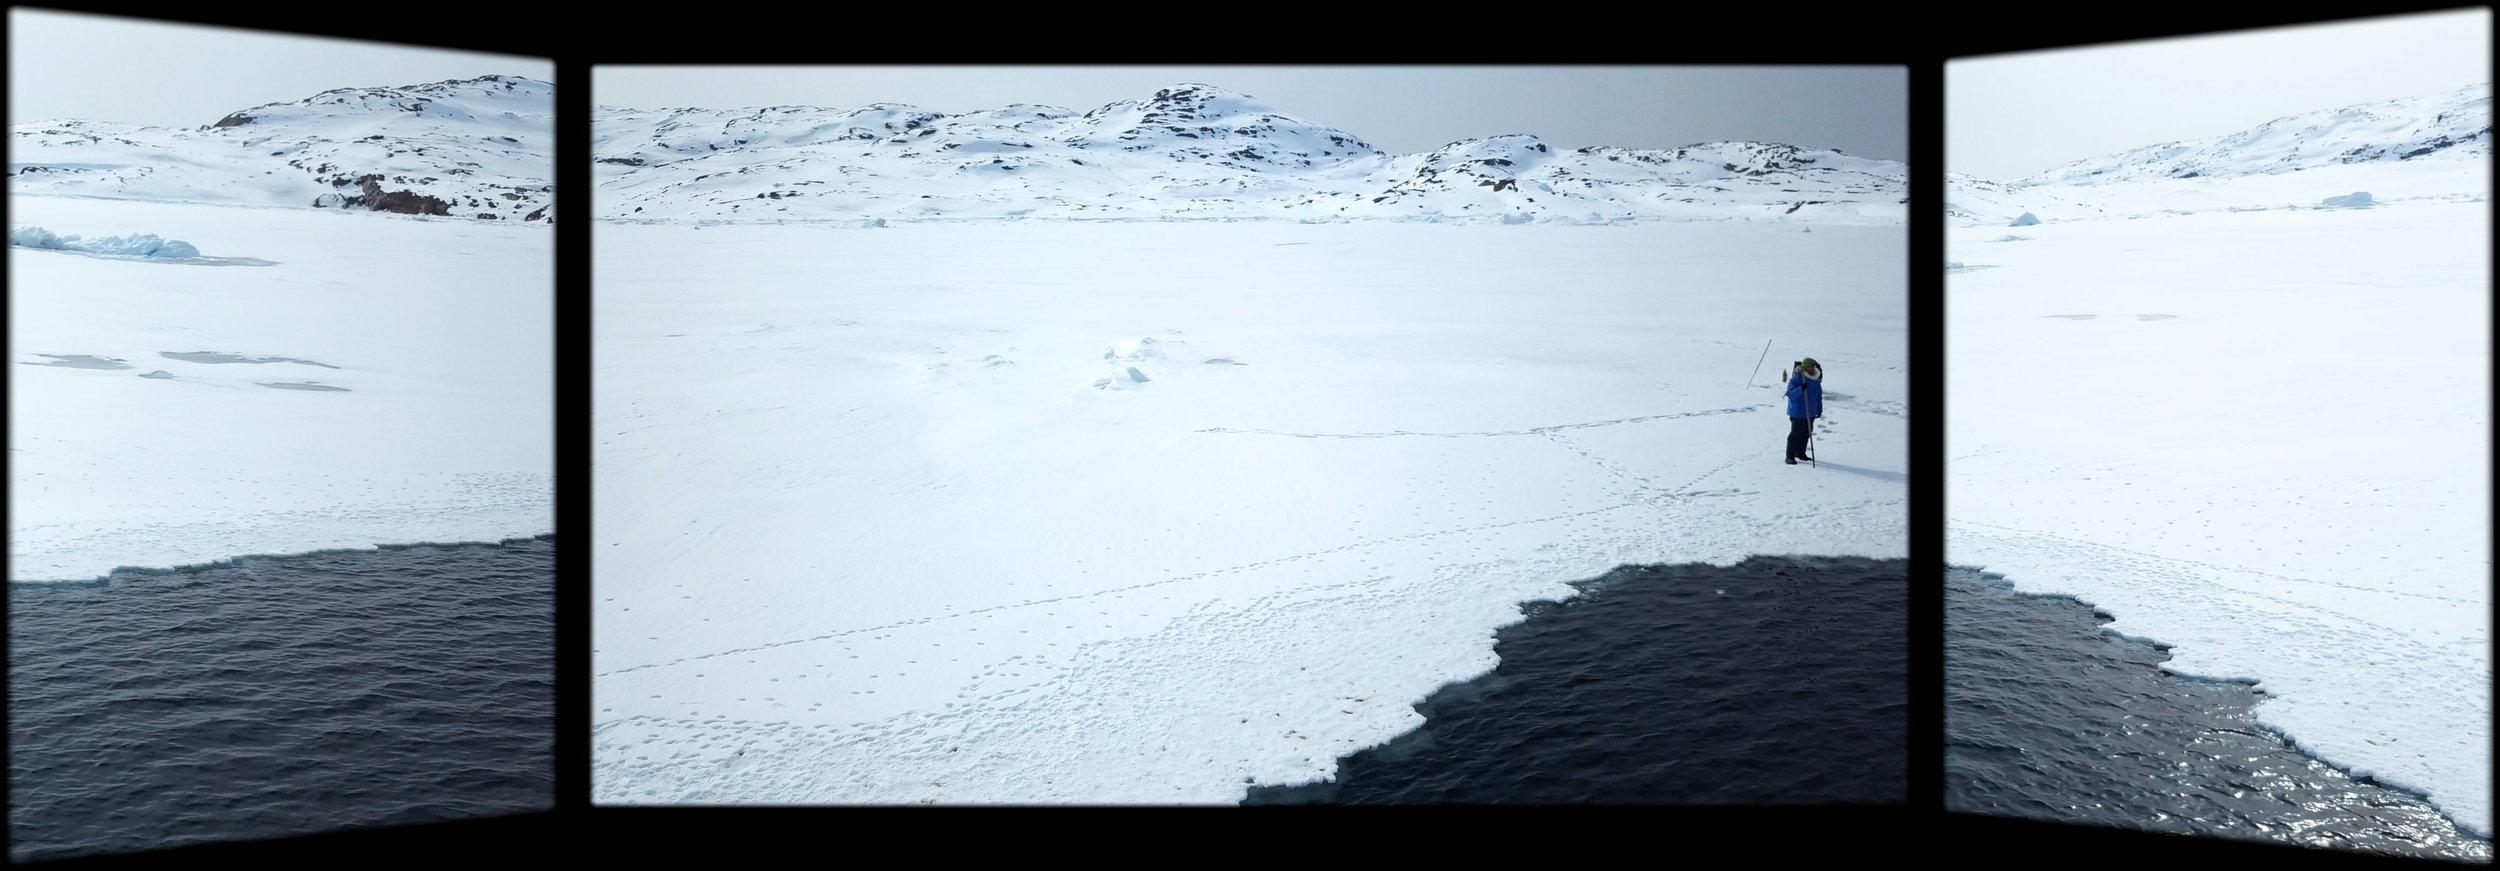 Sea Ice Triptych 1.jpg